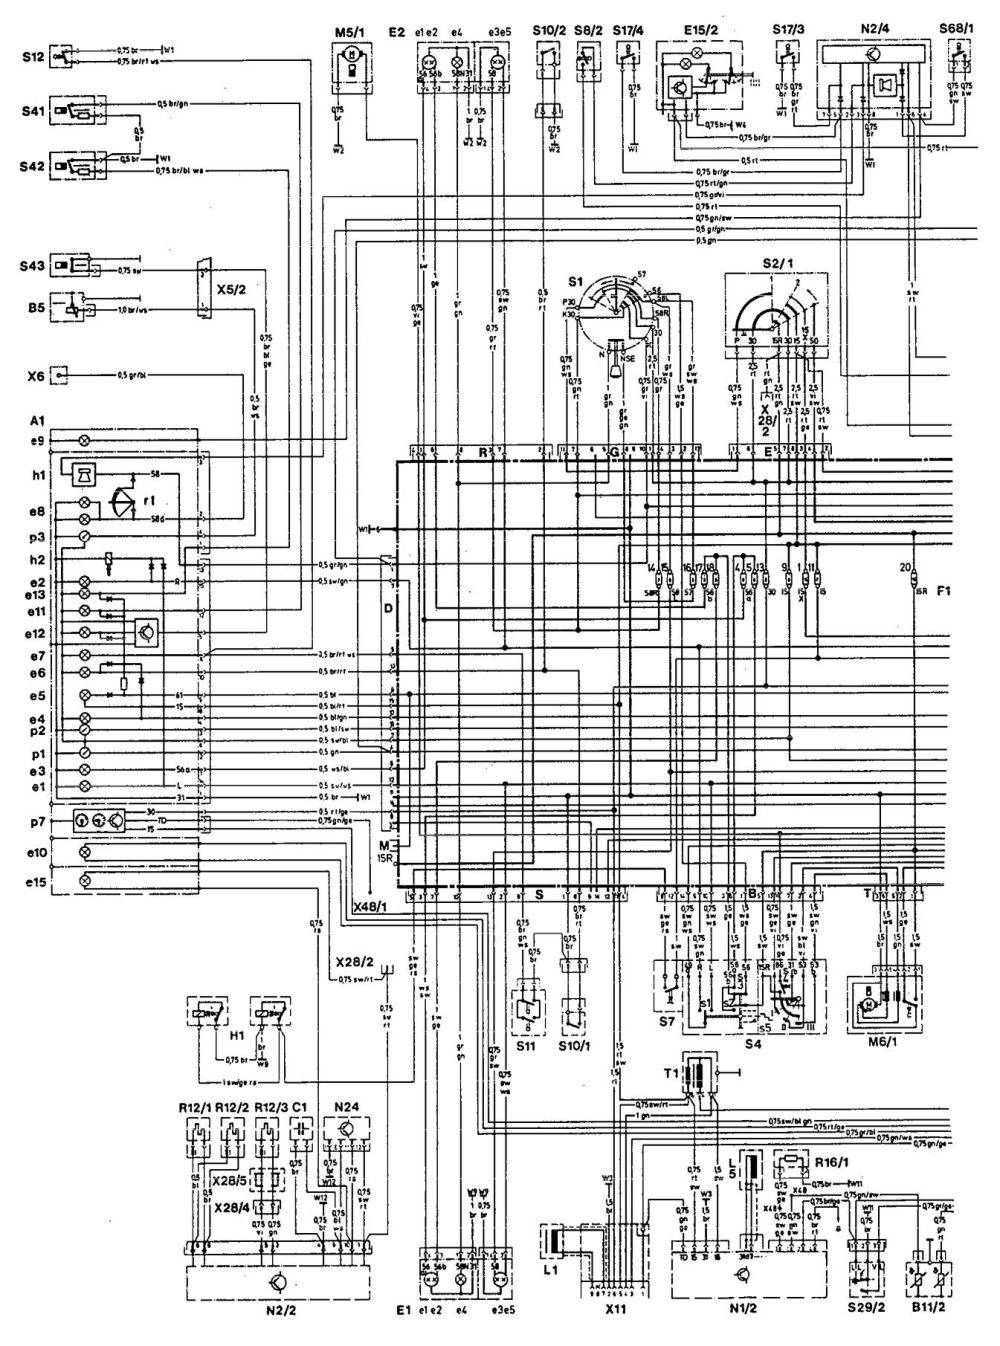 medium resolution of mercedes benz 190e 1993 wiring diagrams starting carknowledge 1993 mercedes benz 190e wiring diagram